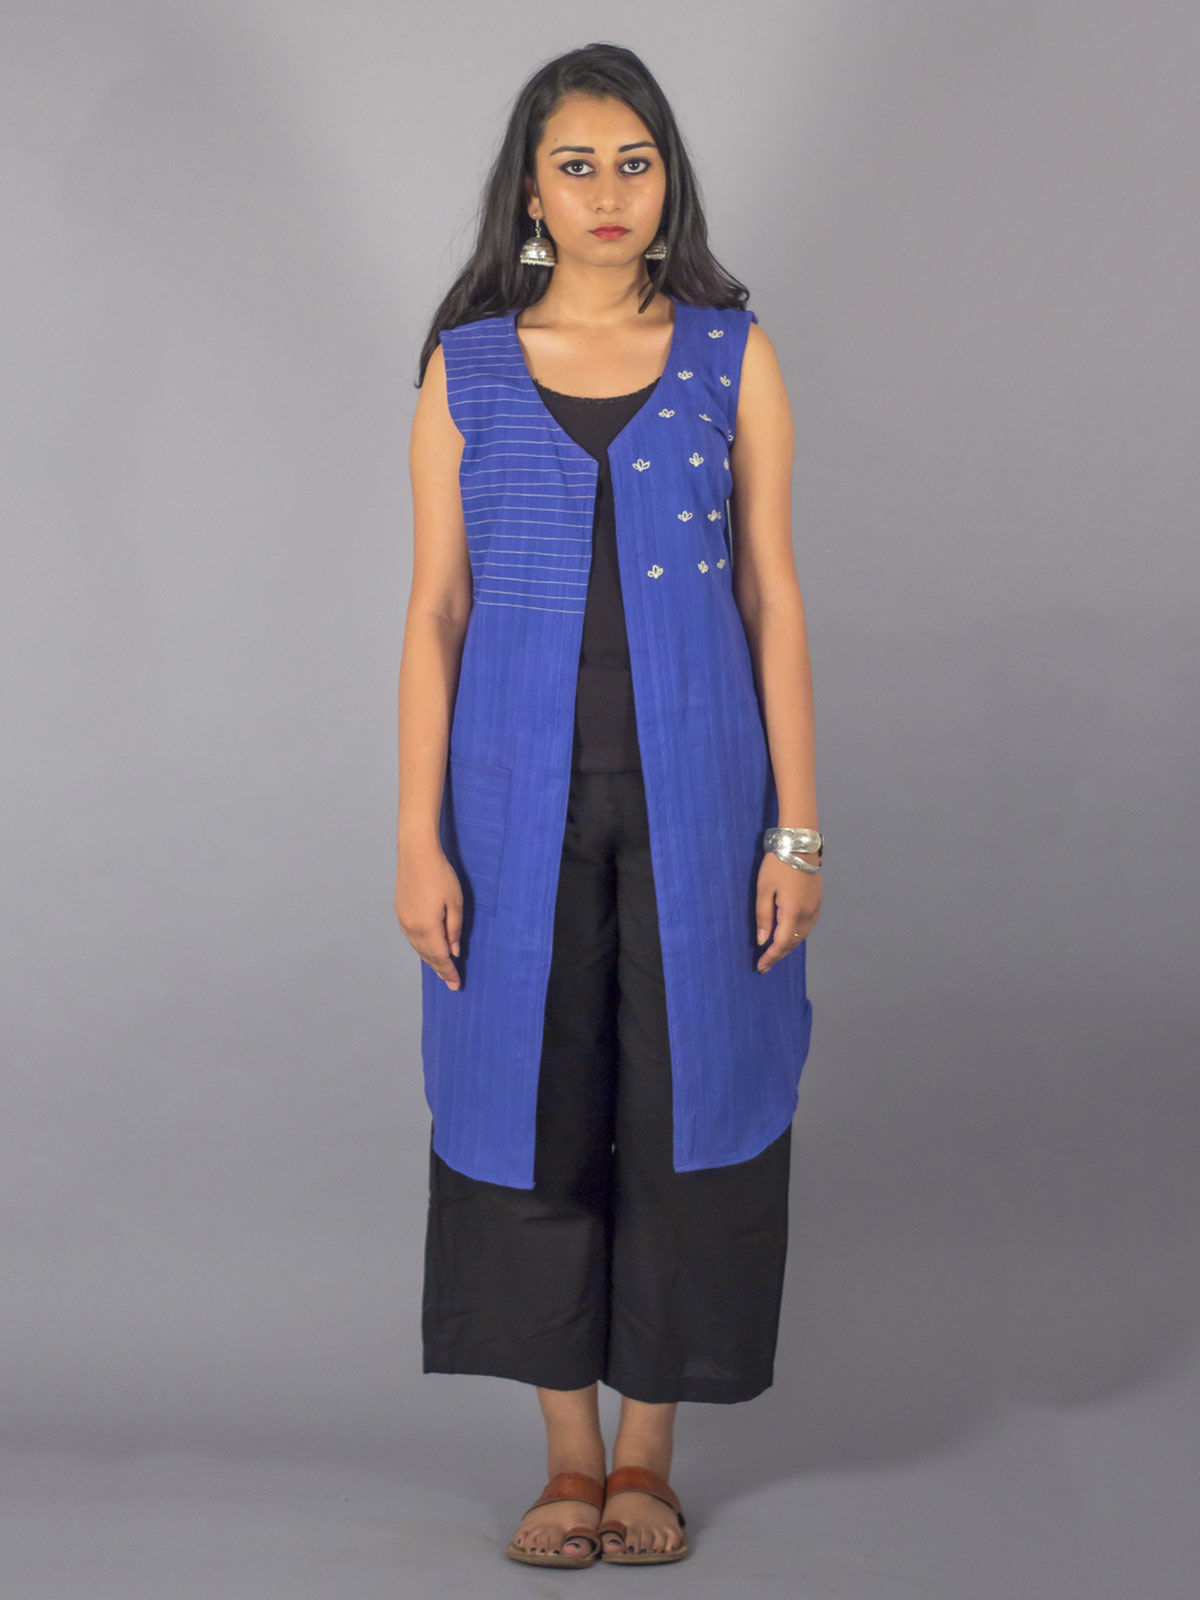 Blue Embroidered Long Shrug